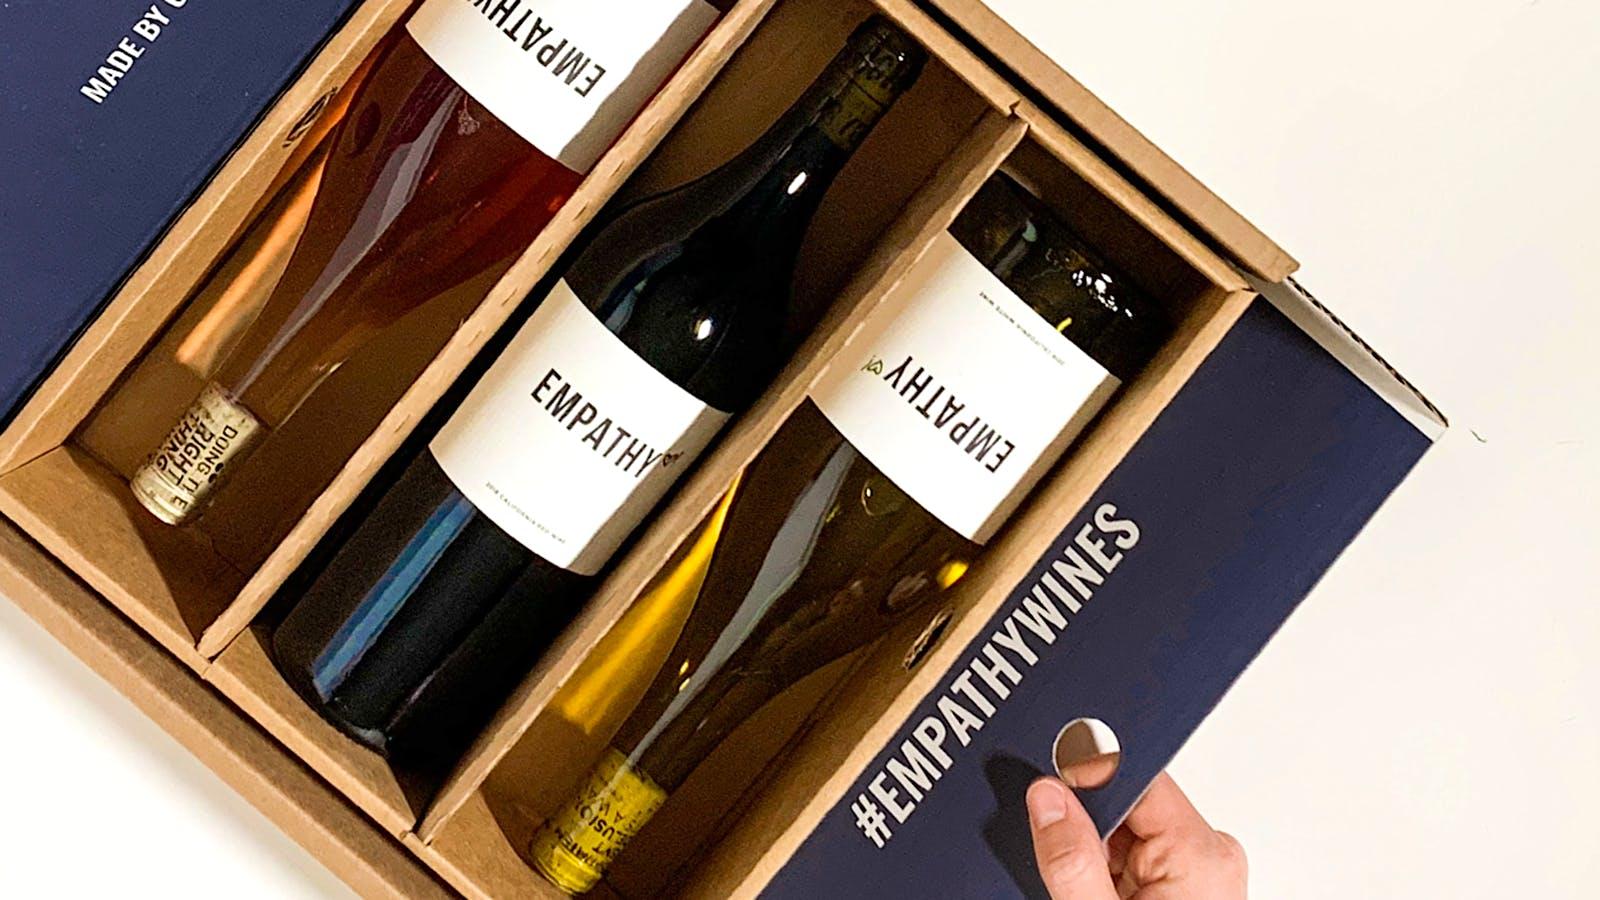 Constellation Brands Buys Gary Vaynerchuk's Empathy Wines